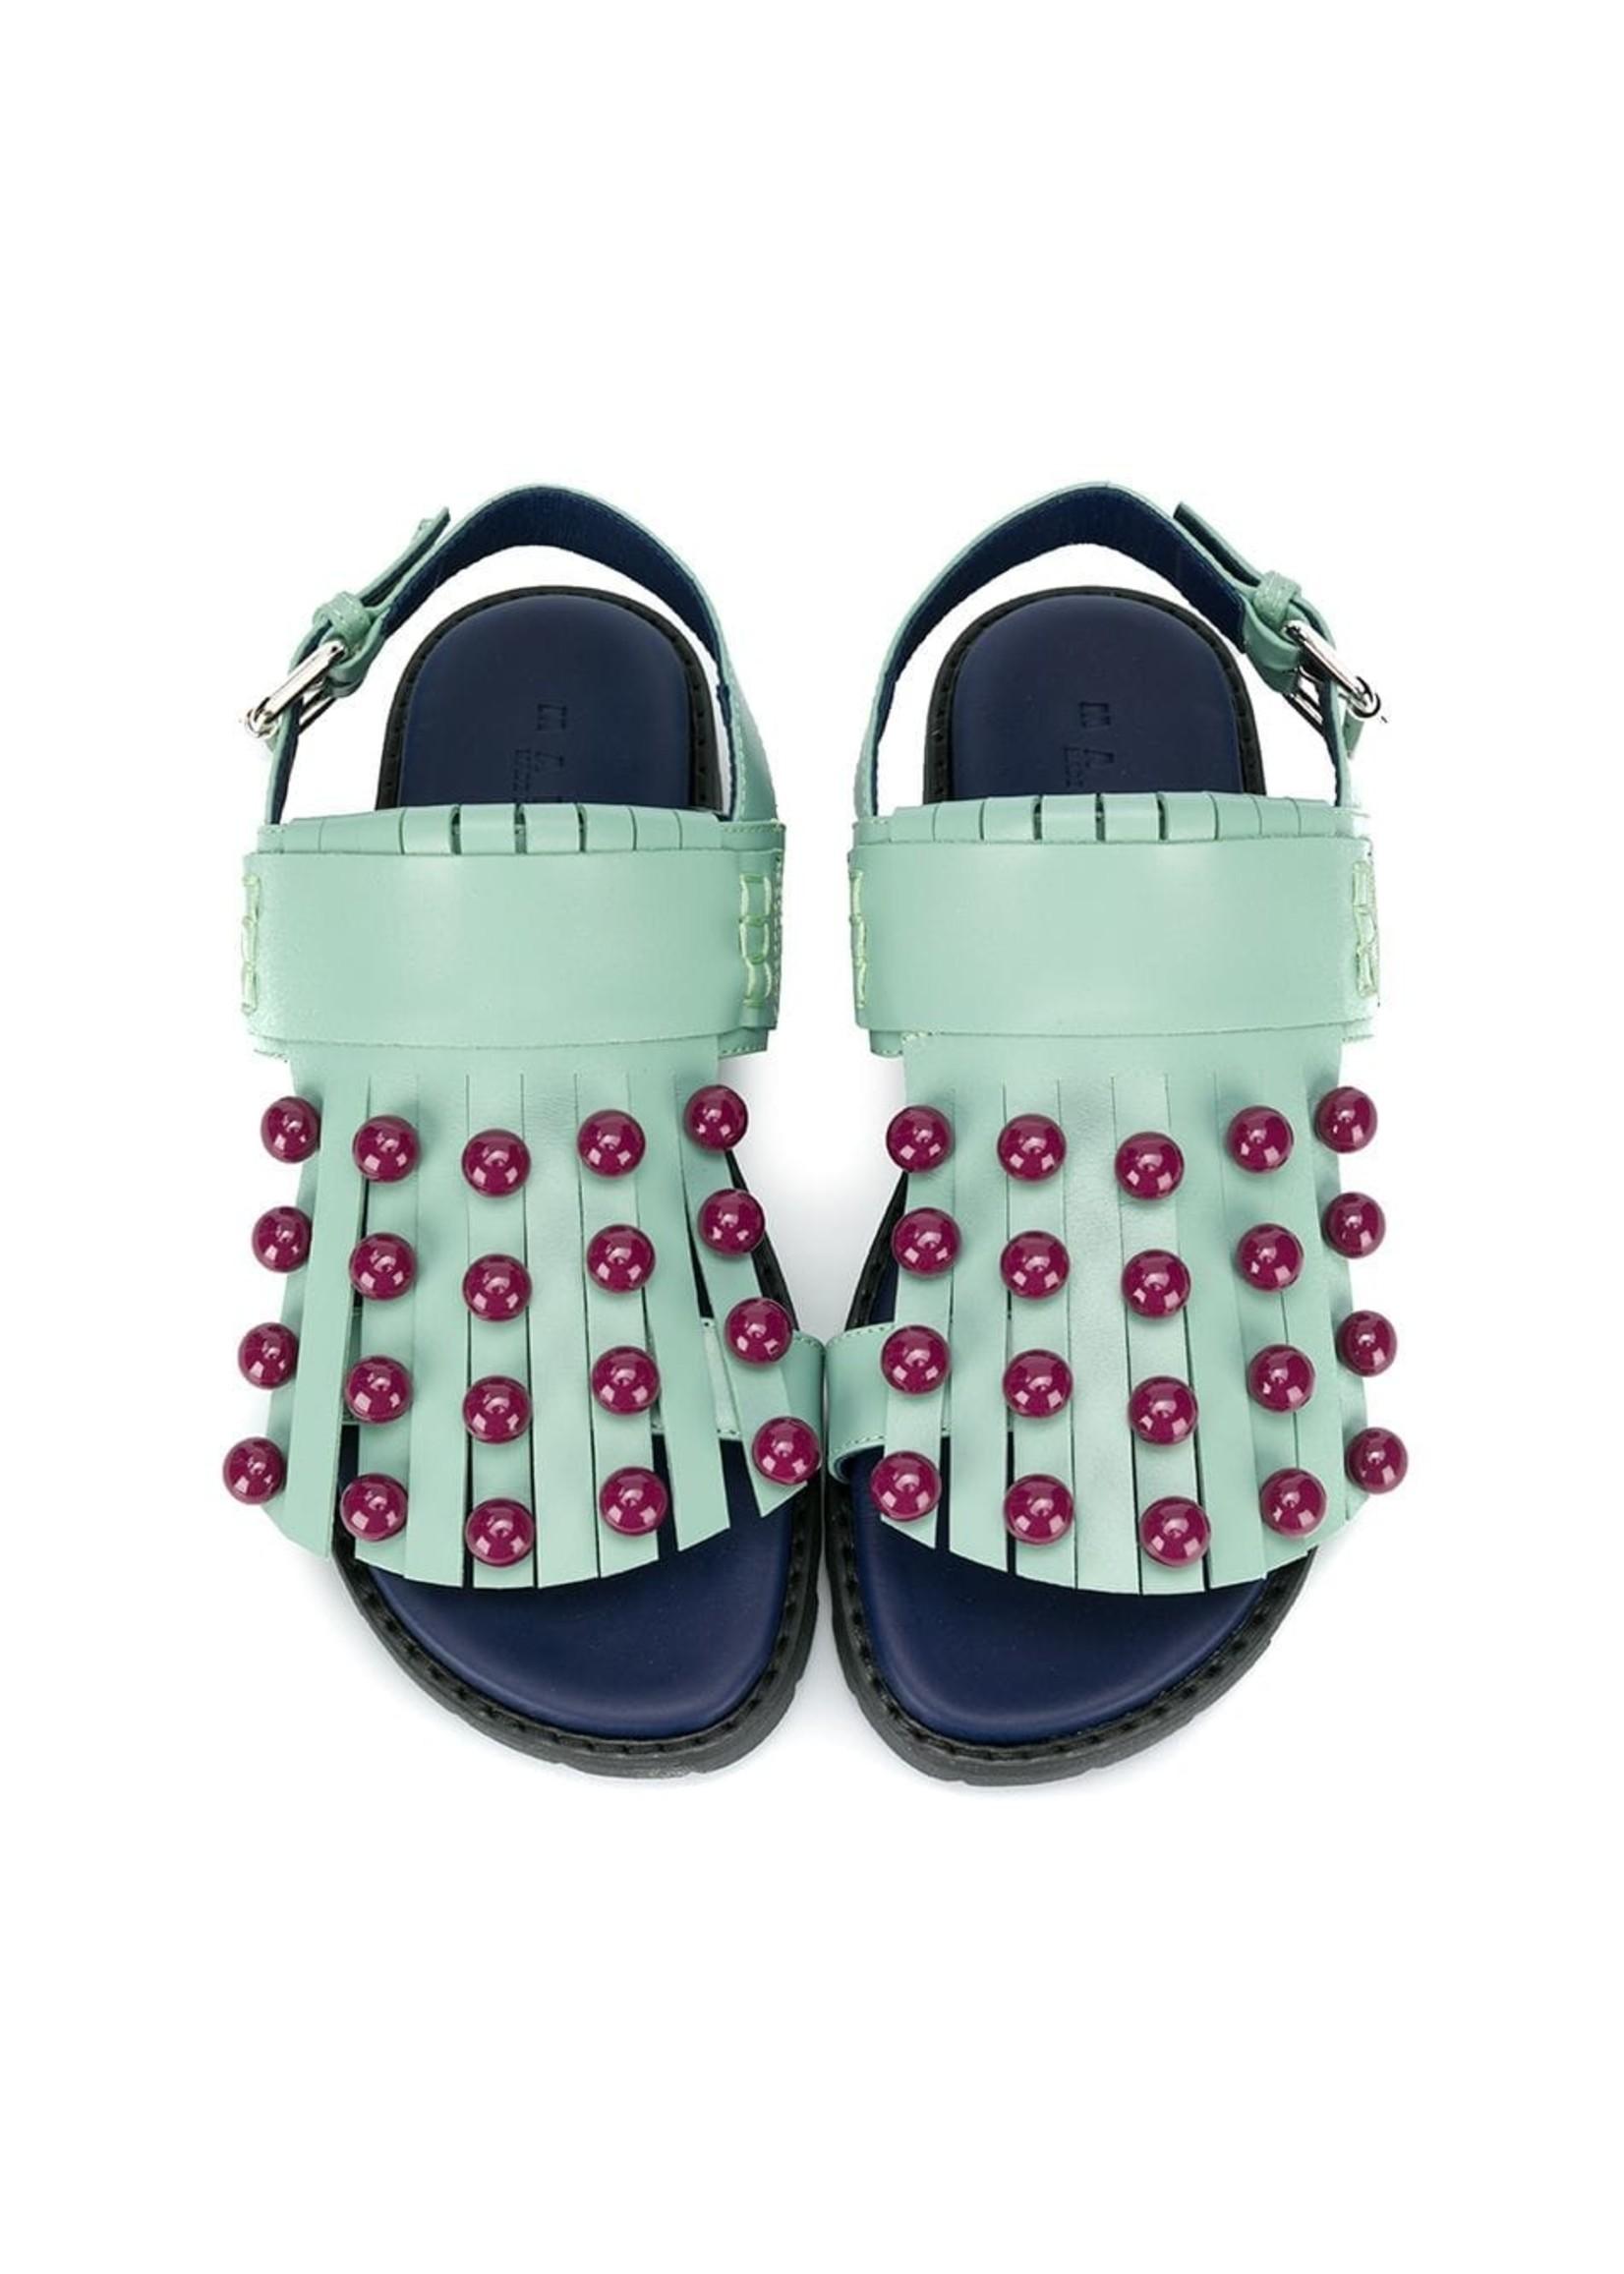 Marni Marni shoes tasseled sandals